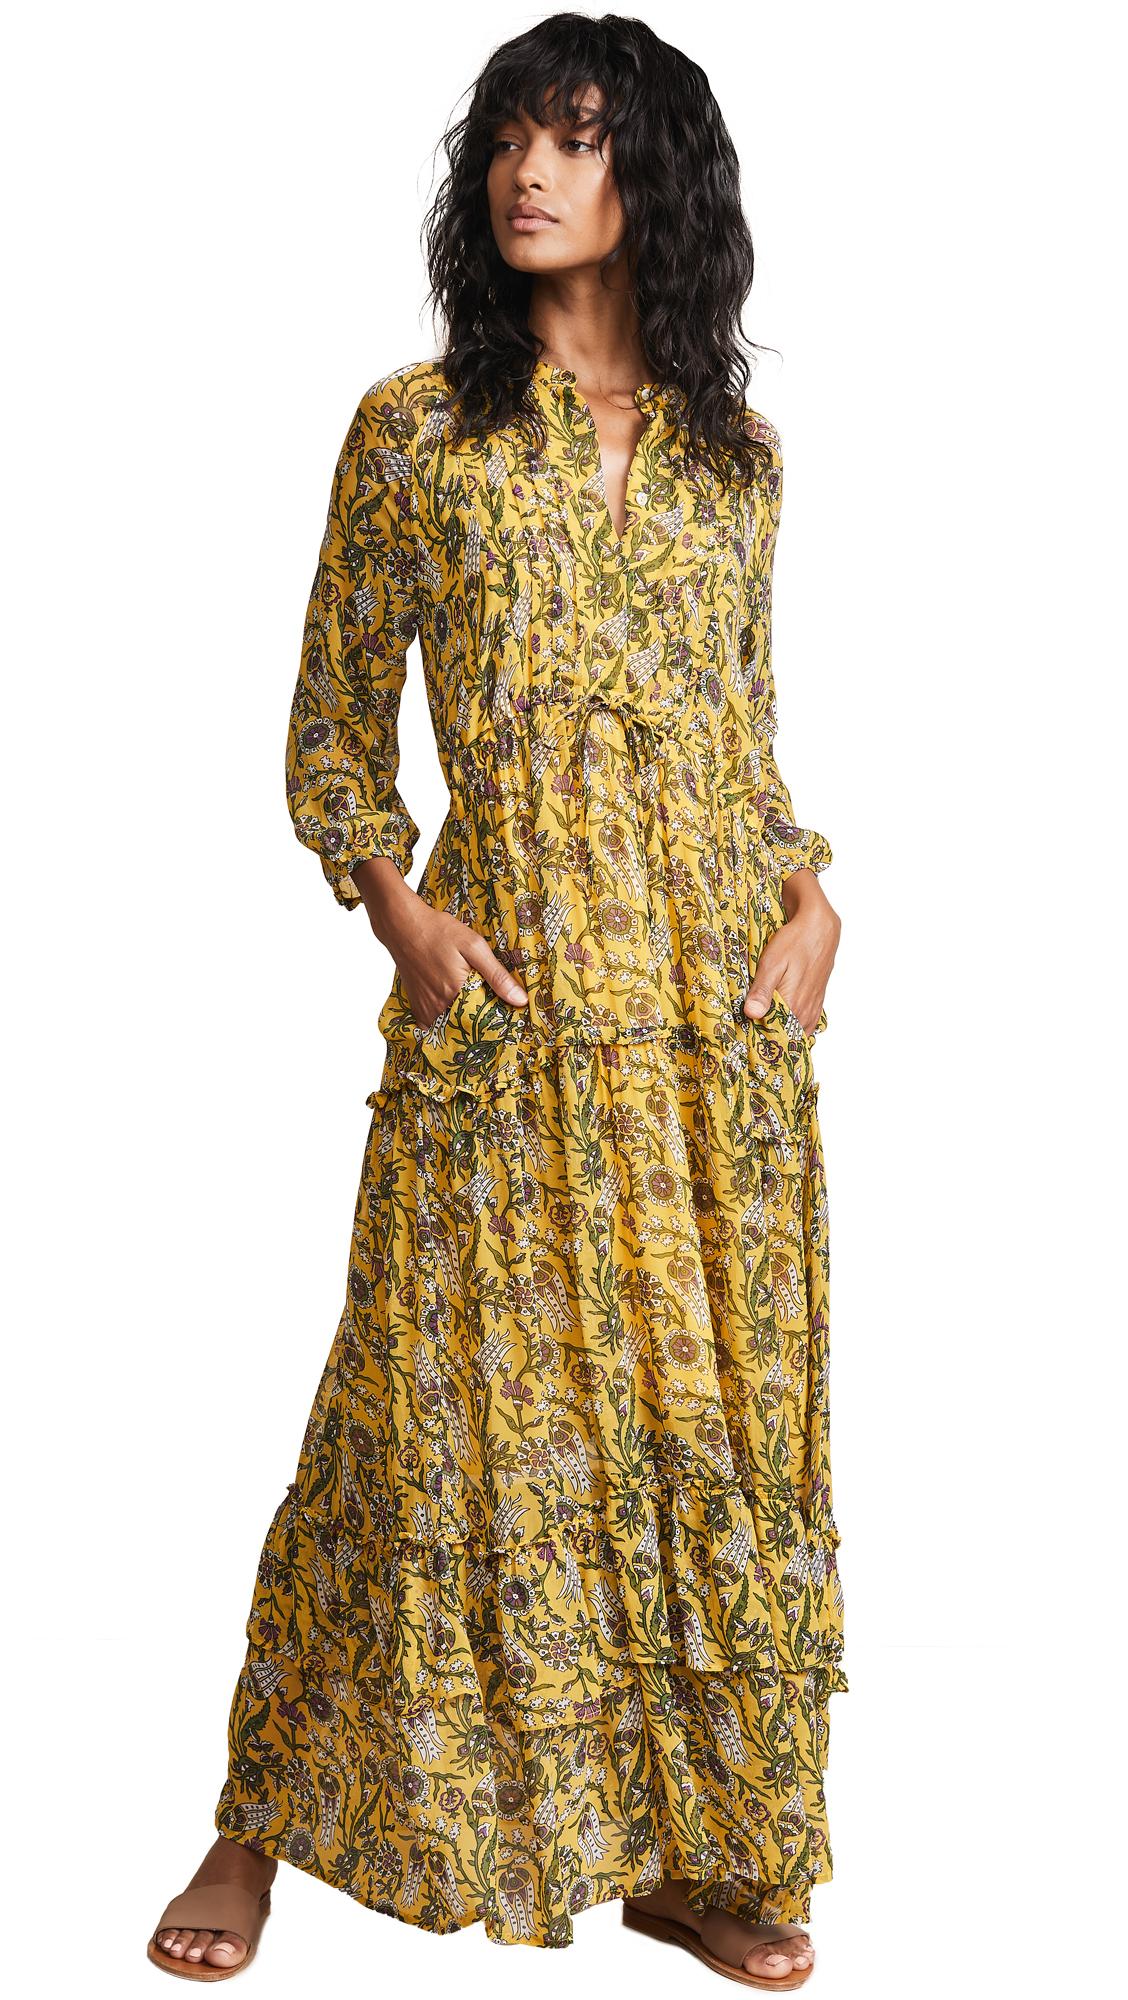 Banjanan Bazaar Dress In Orient Flower Mustard